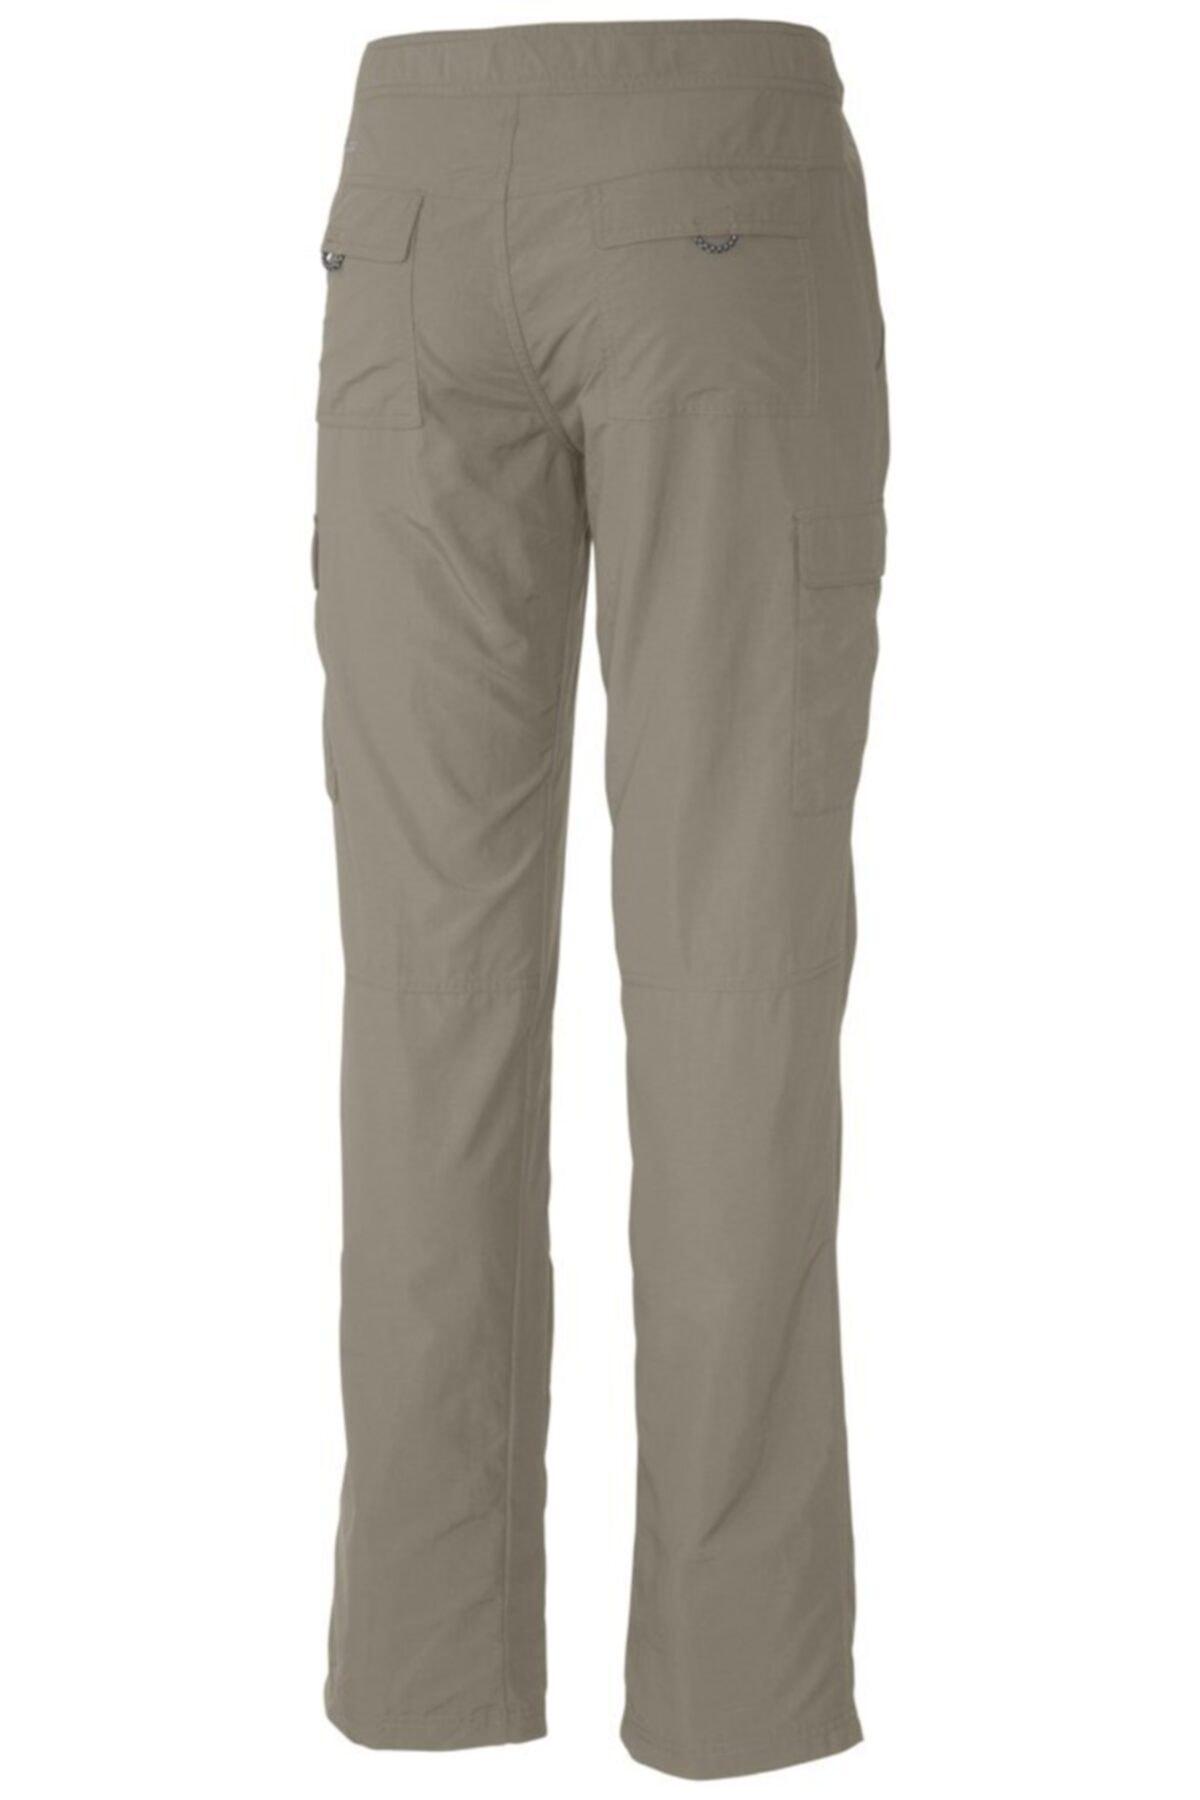 Columbia Am8686-221 Cascades Explorer Erkek Pantolon 1592691221 2